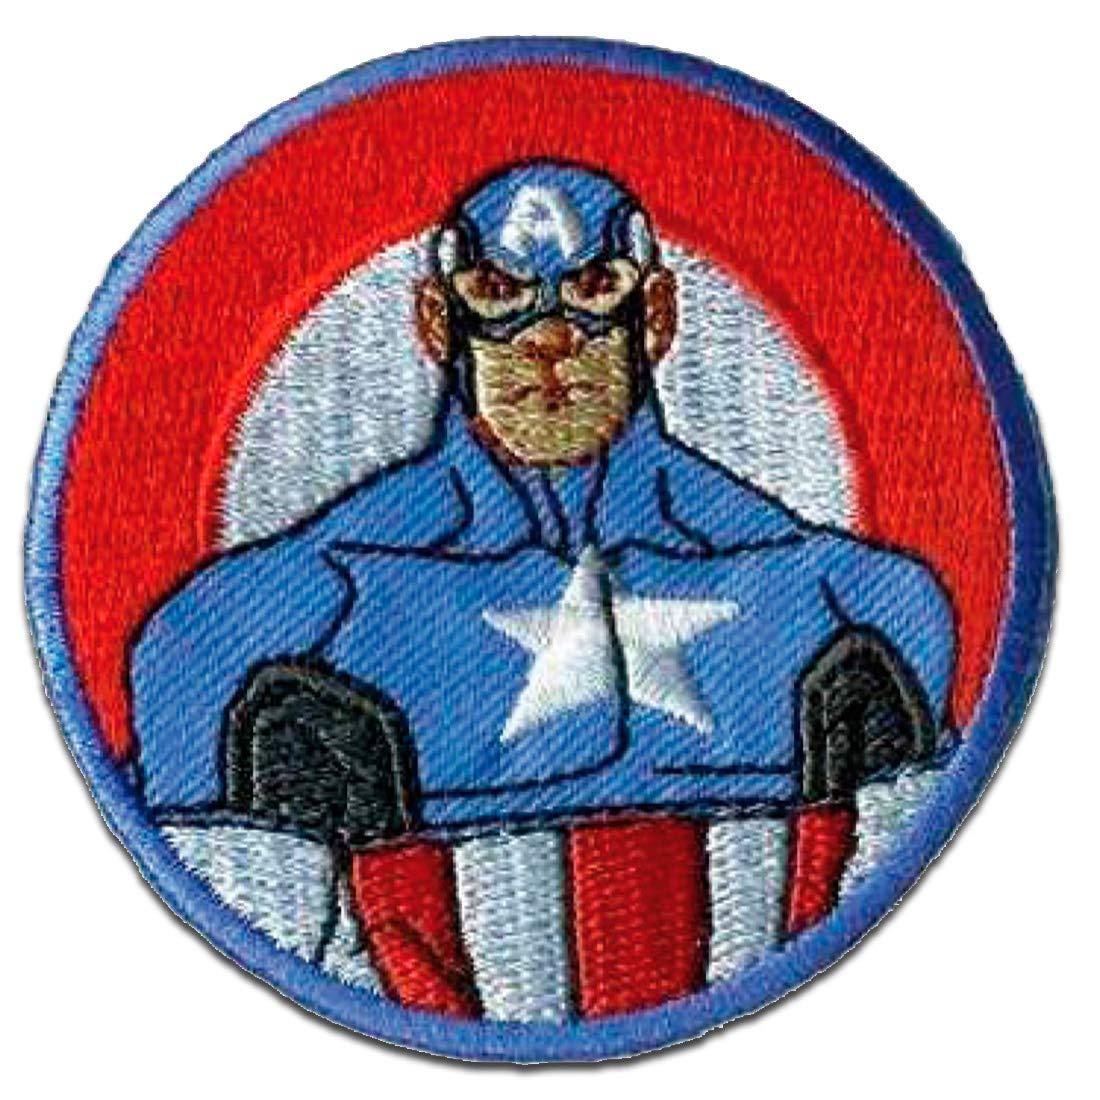 Ecusson 6 x 6 cm by Marvel/© catch-the-patch/® patches brode appliques embroidery thermocollant Avengers Les Vengeurs Captain America 2 color/é